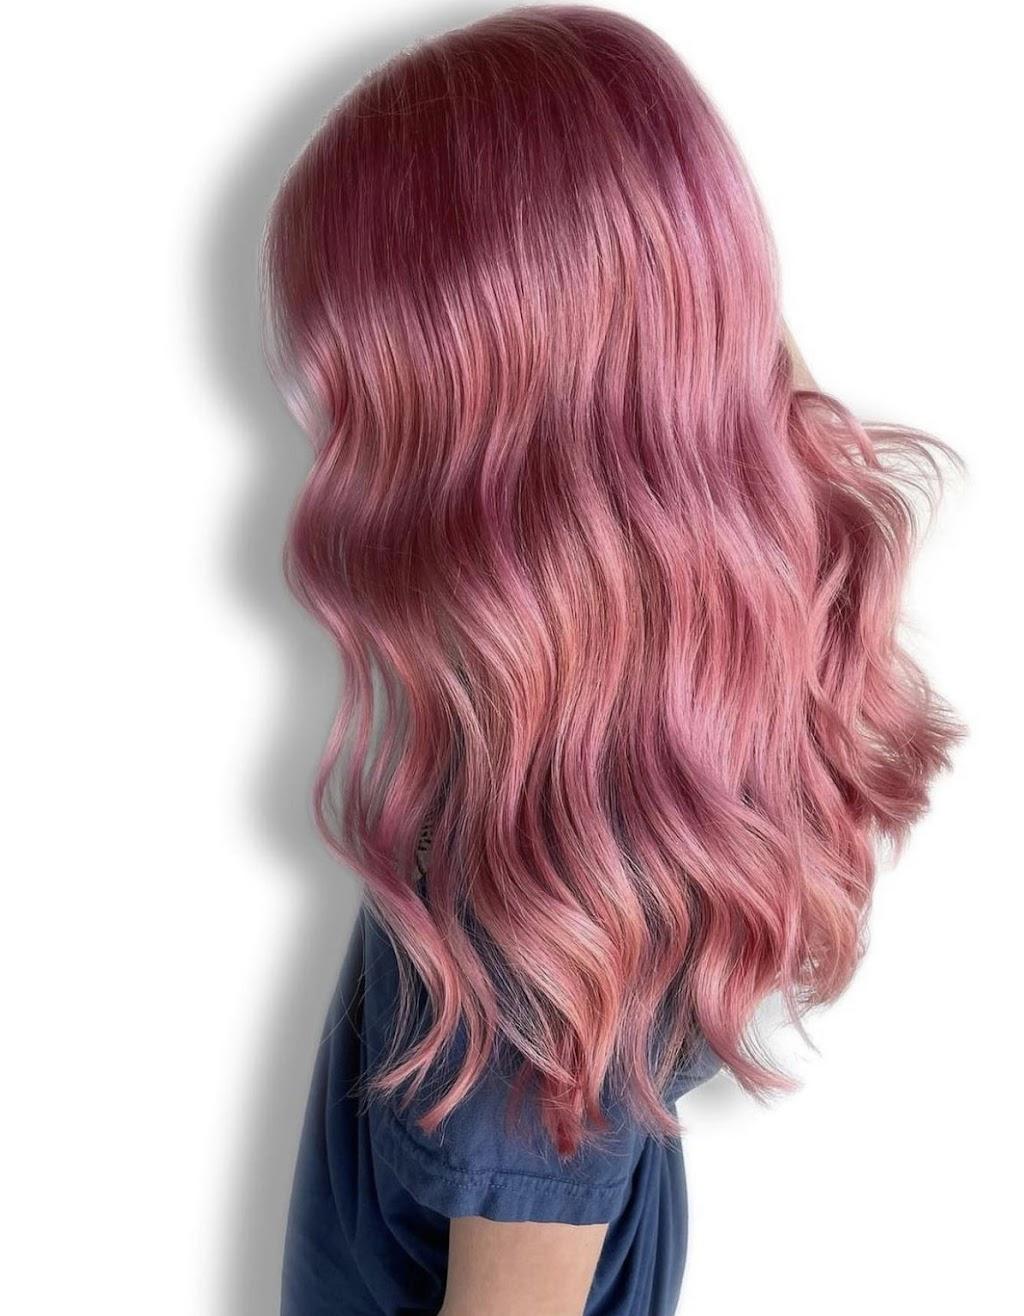 Evolve Simply Beauty - hair care    Photo 9 of 10   Address: 4590 N Maize Rd #8, Maize, KS 67101, USA   Phone: (316) 927-2400